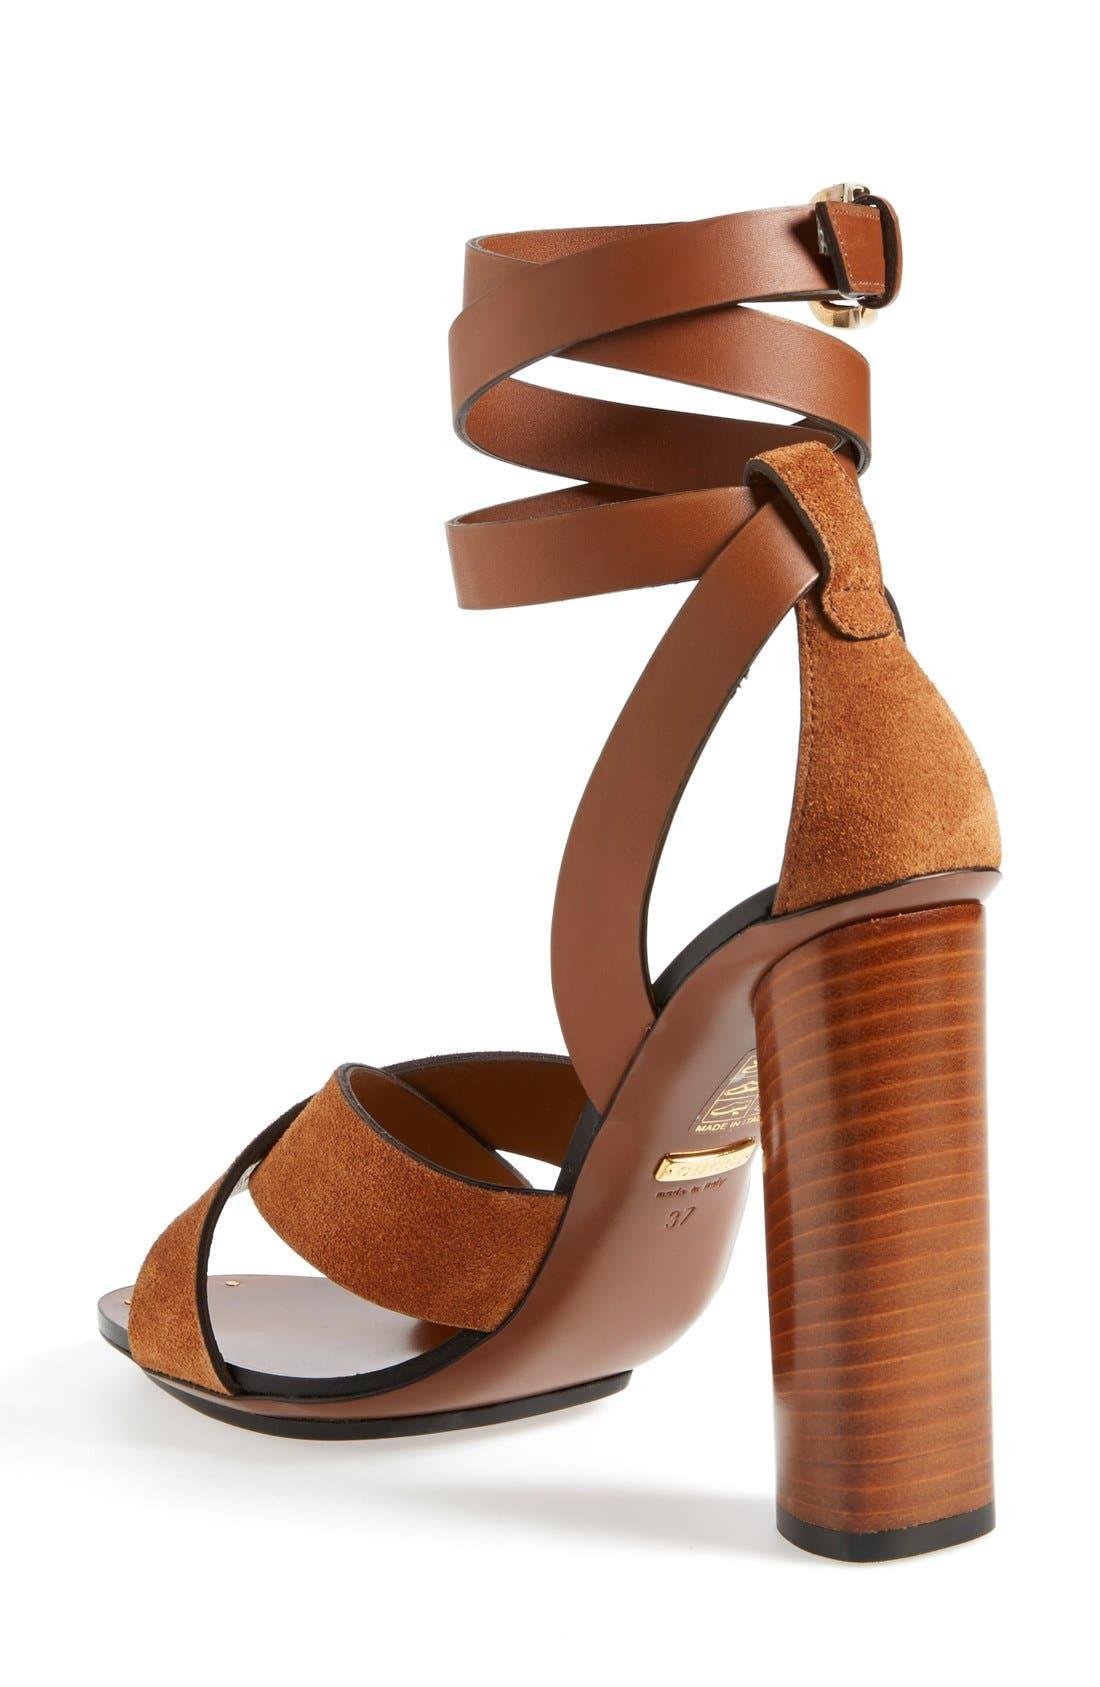 Alternate Image 2  - Gucci 'Candy' Ankle Strap Sandal (Women)